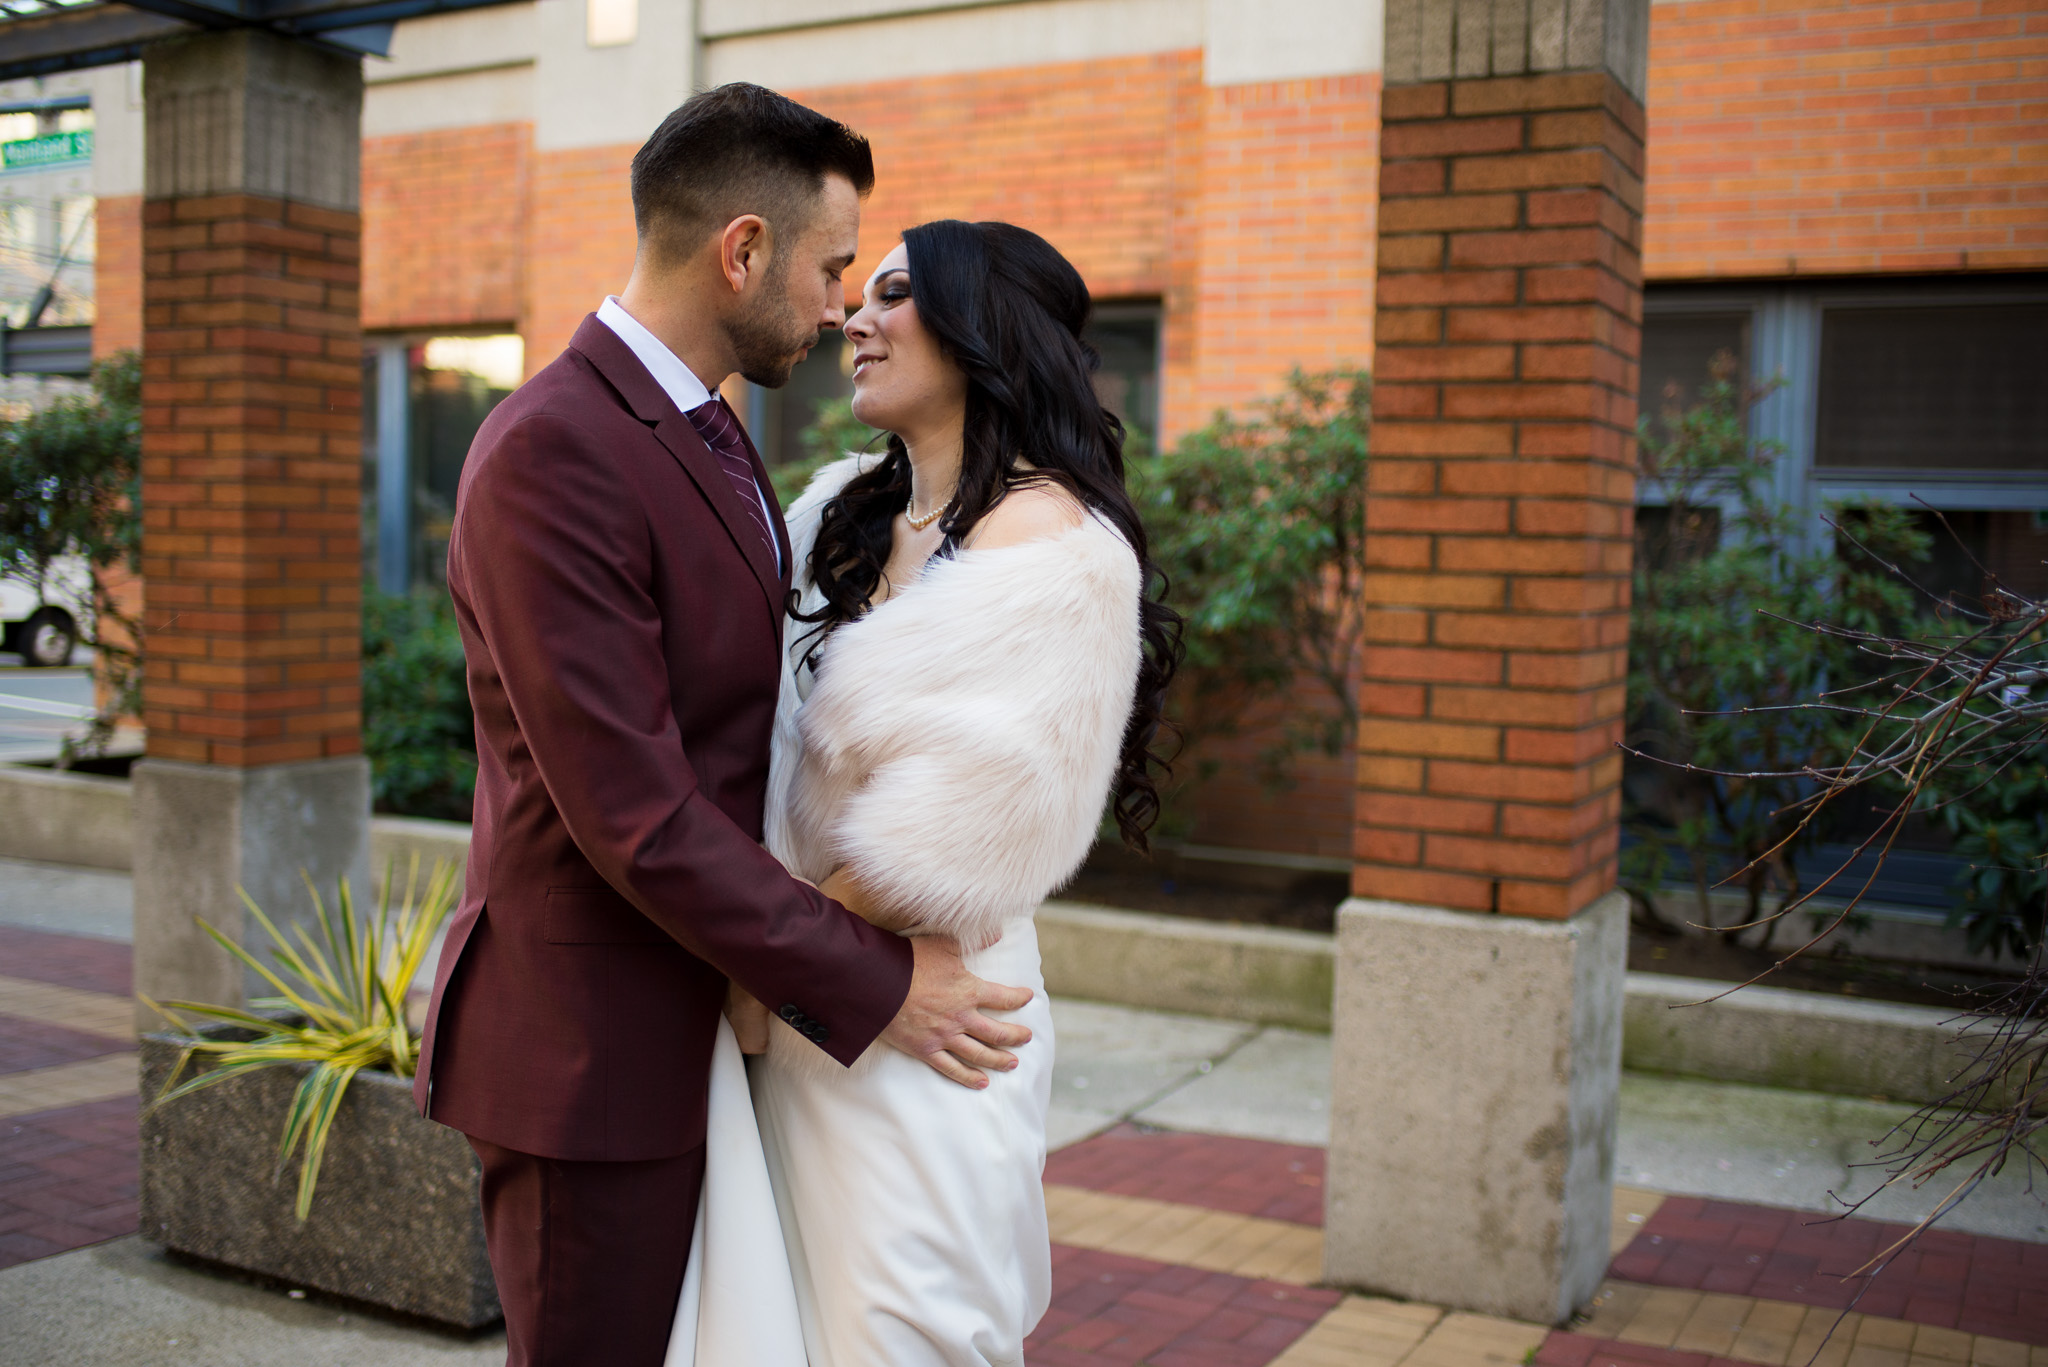 Brix and Mortar Wedding Photos-26.jpg